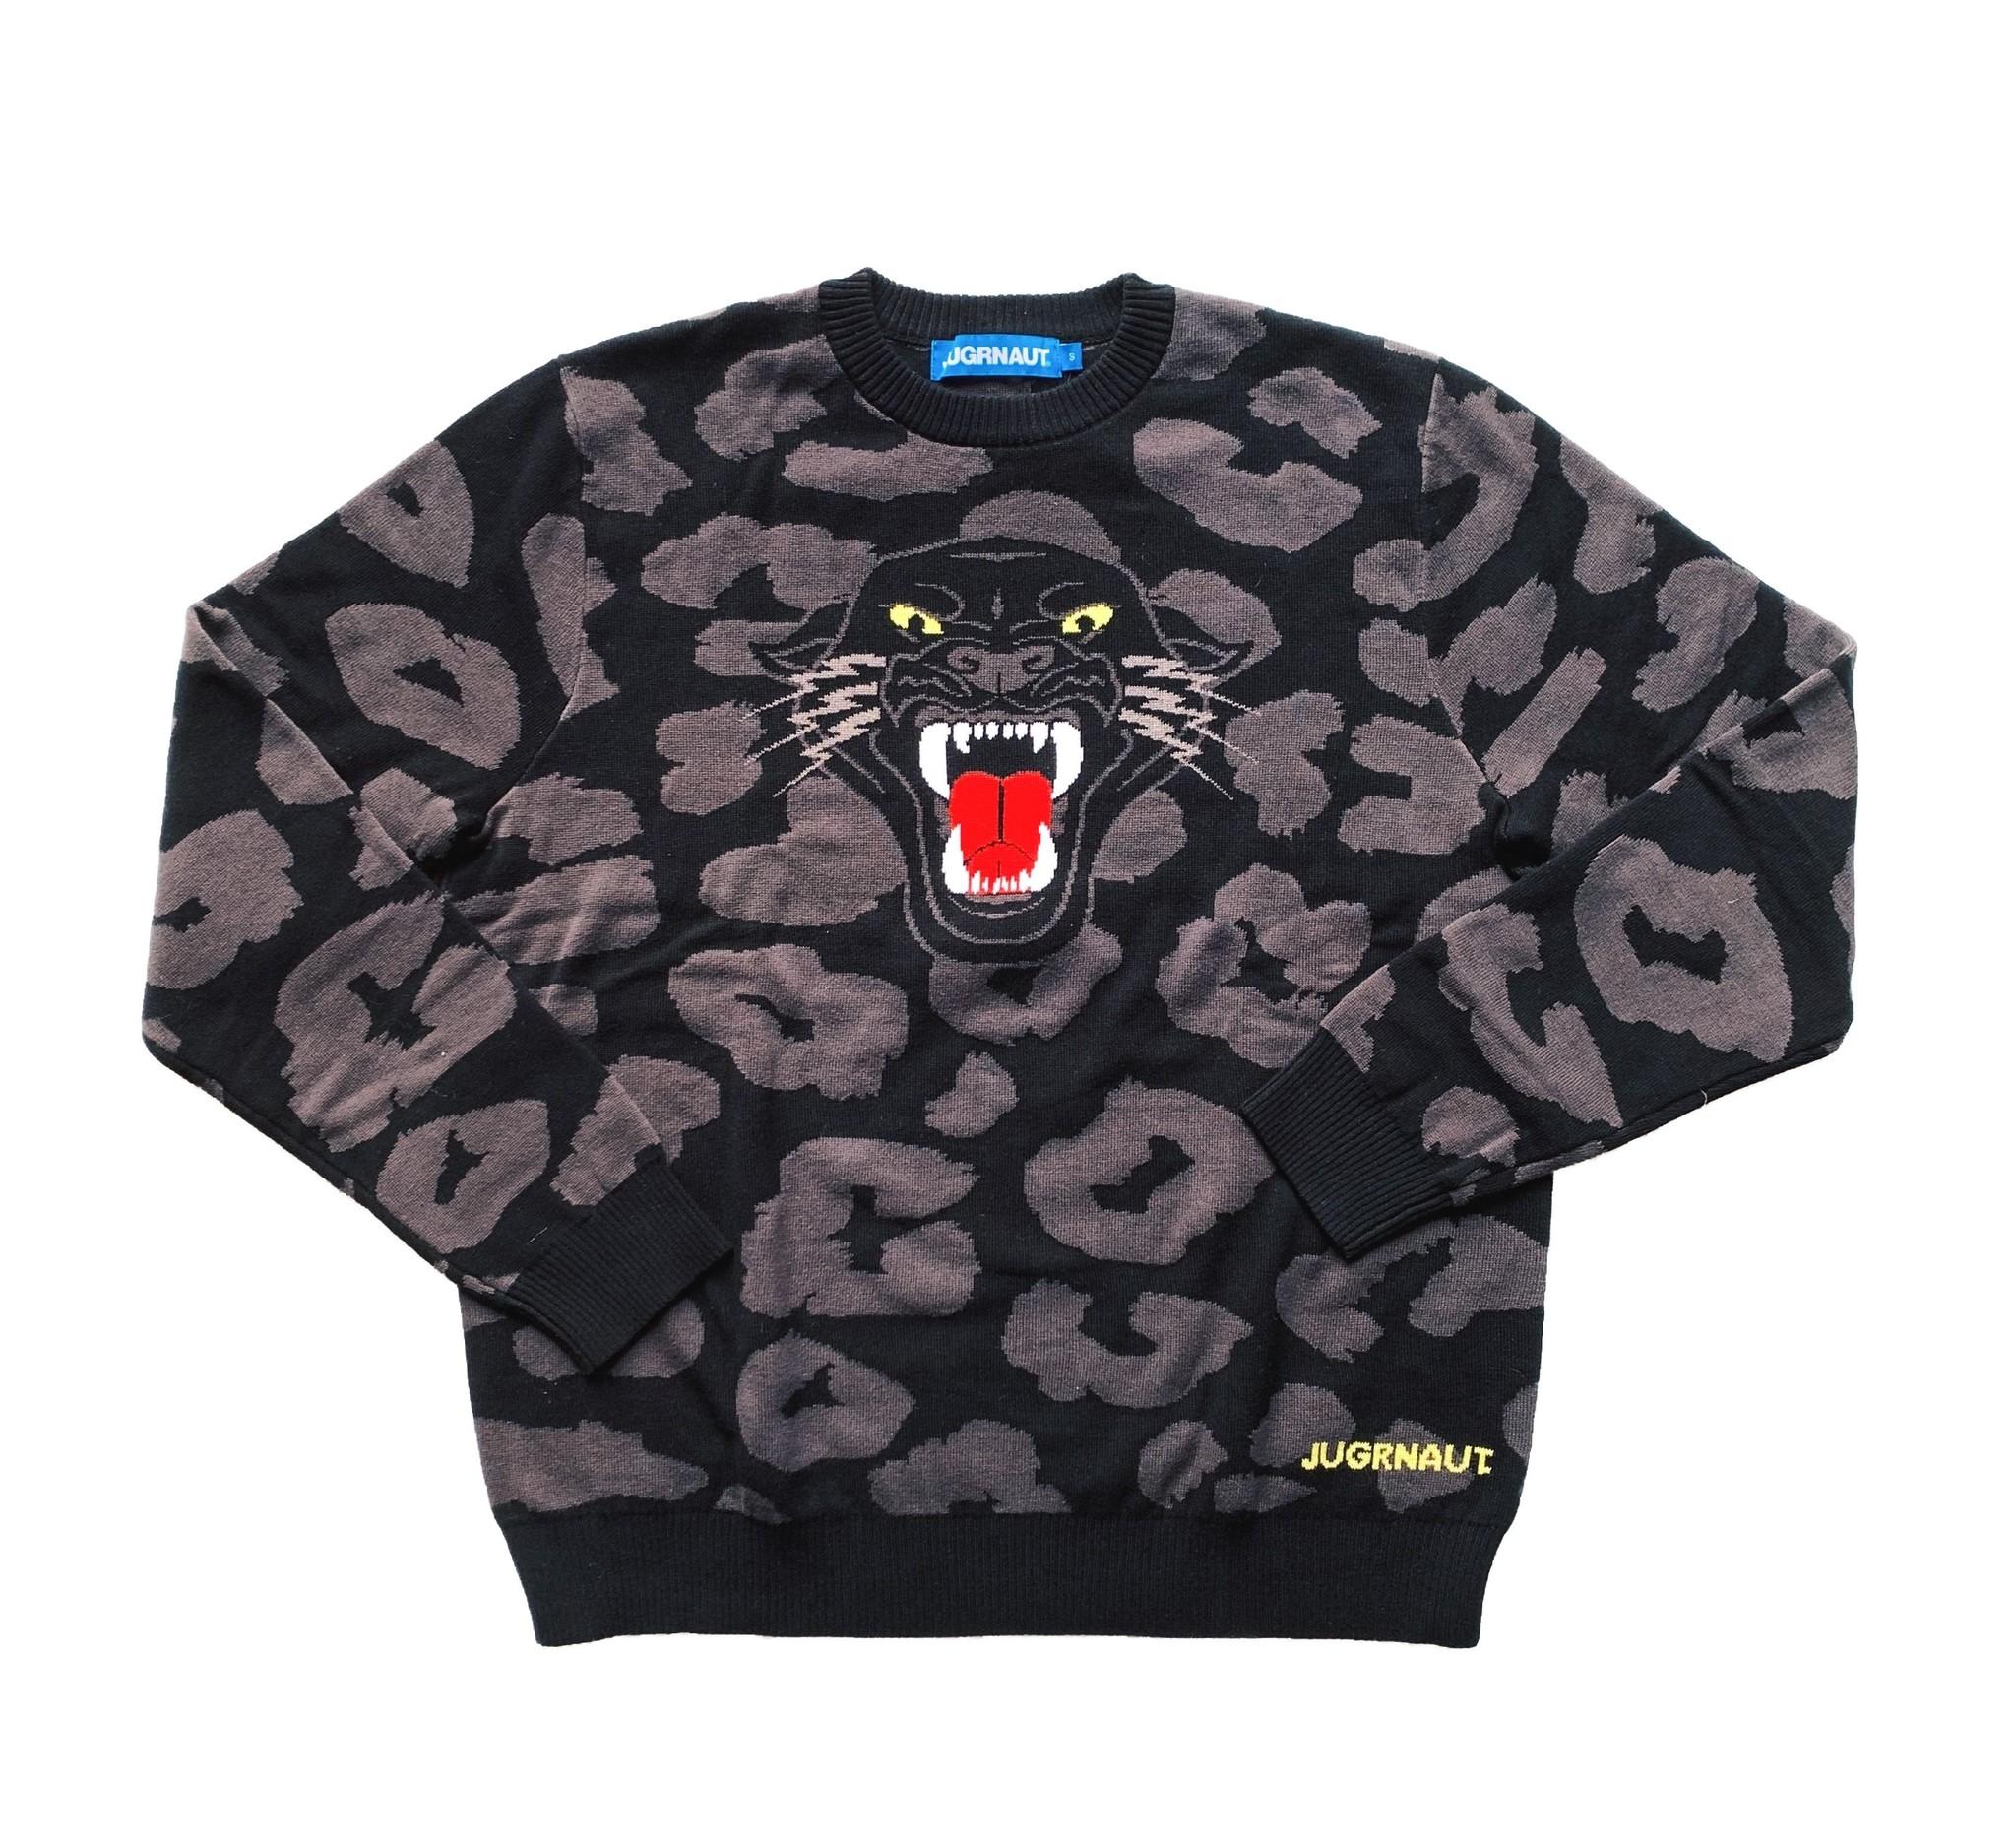 Jugrnaut Jugrnaut Black Cat Sweater Black